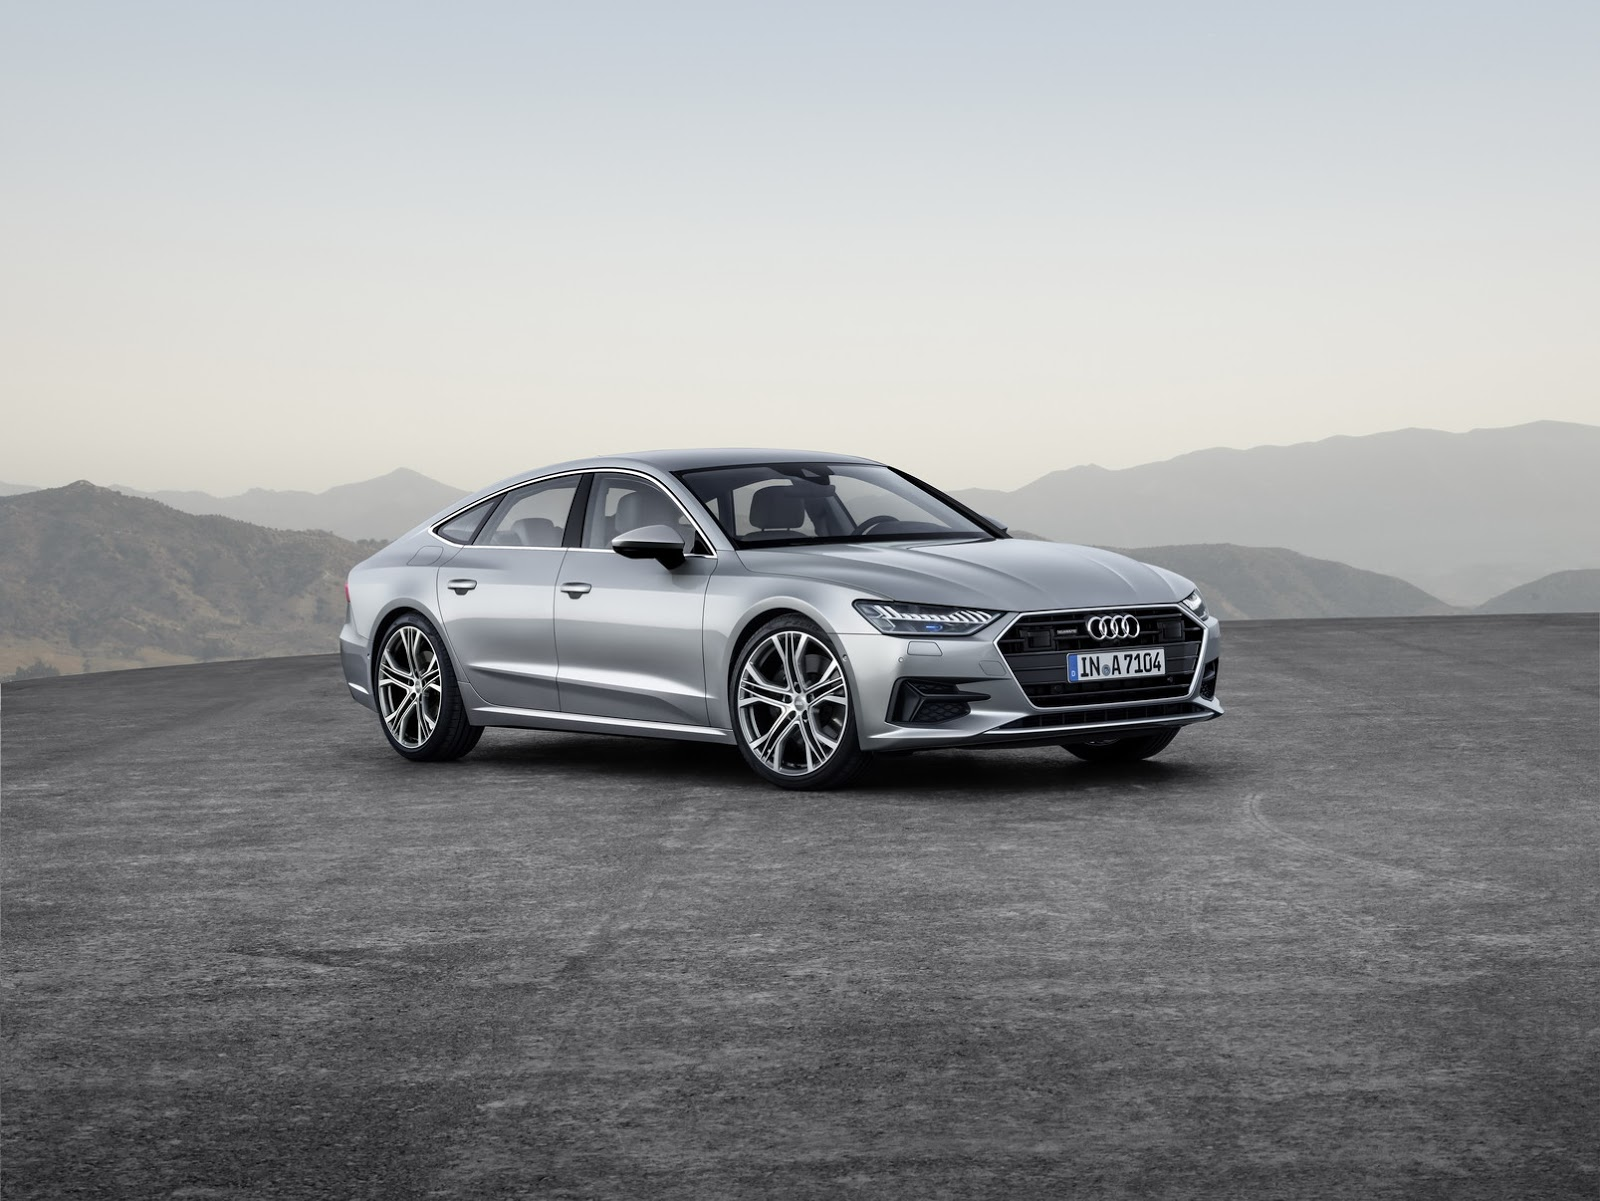 2018_Audi_A7_Sportback_0008